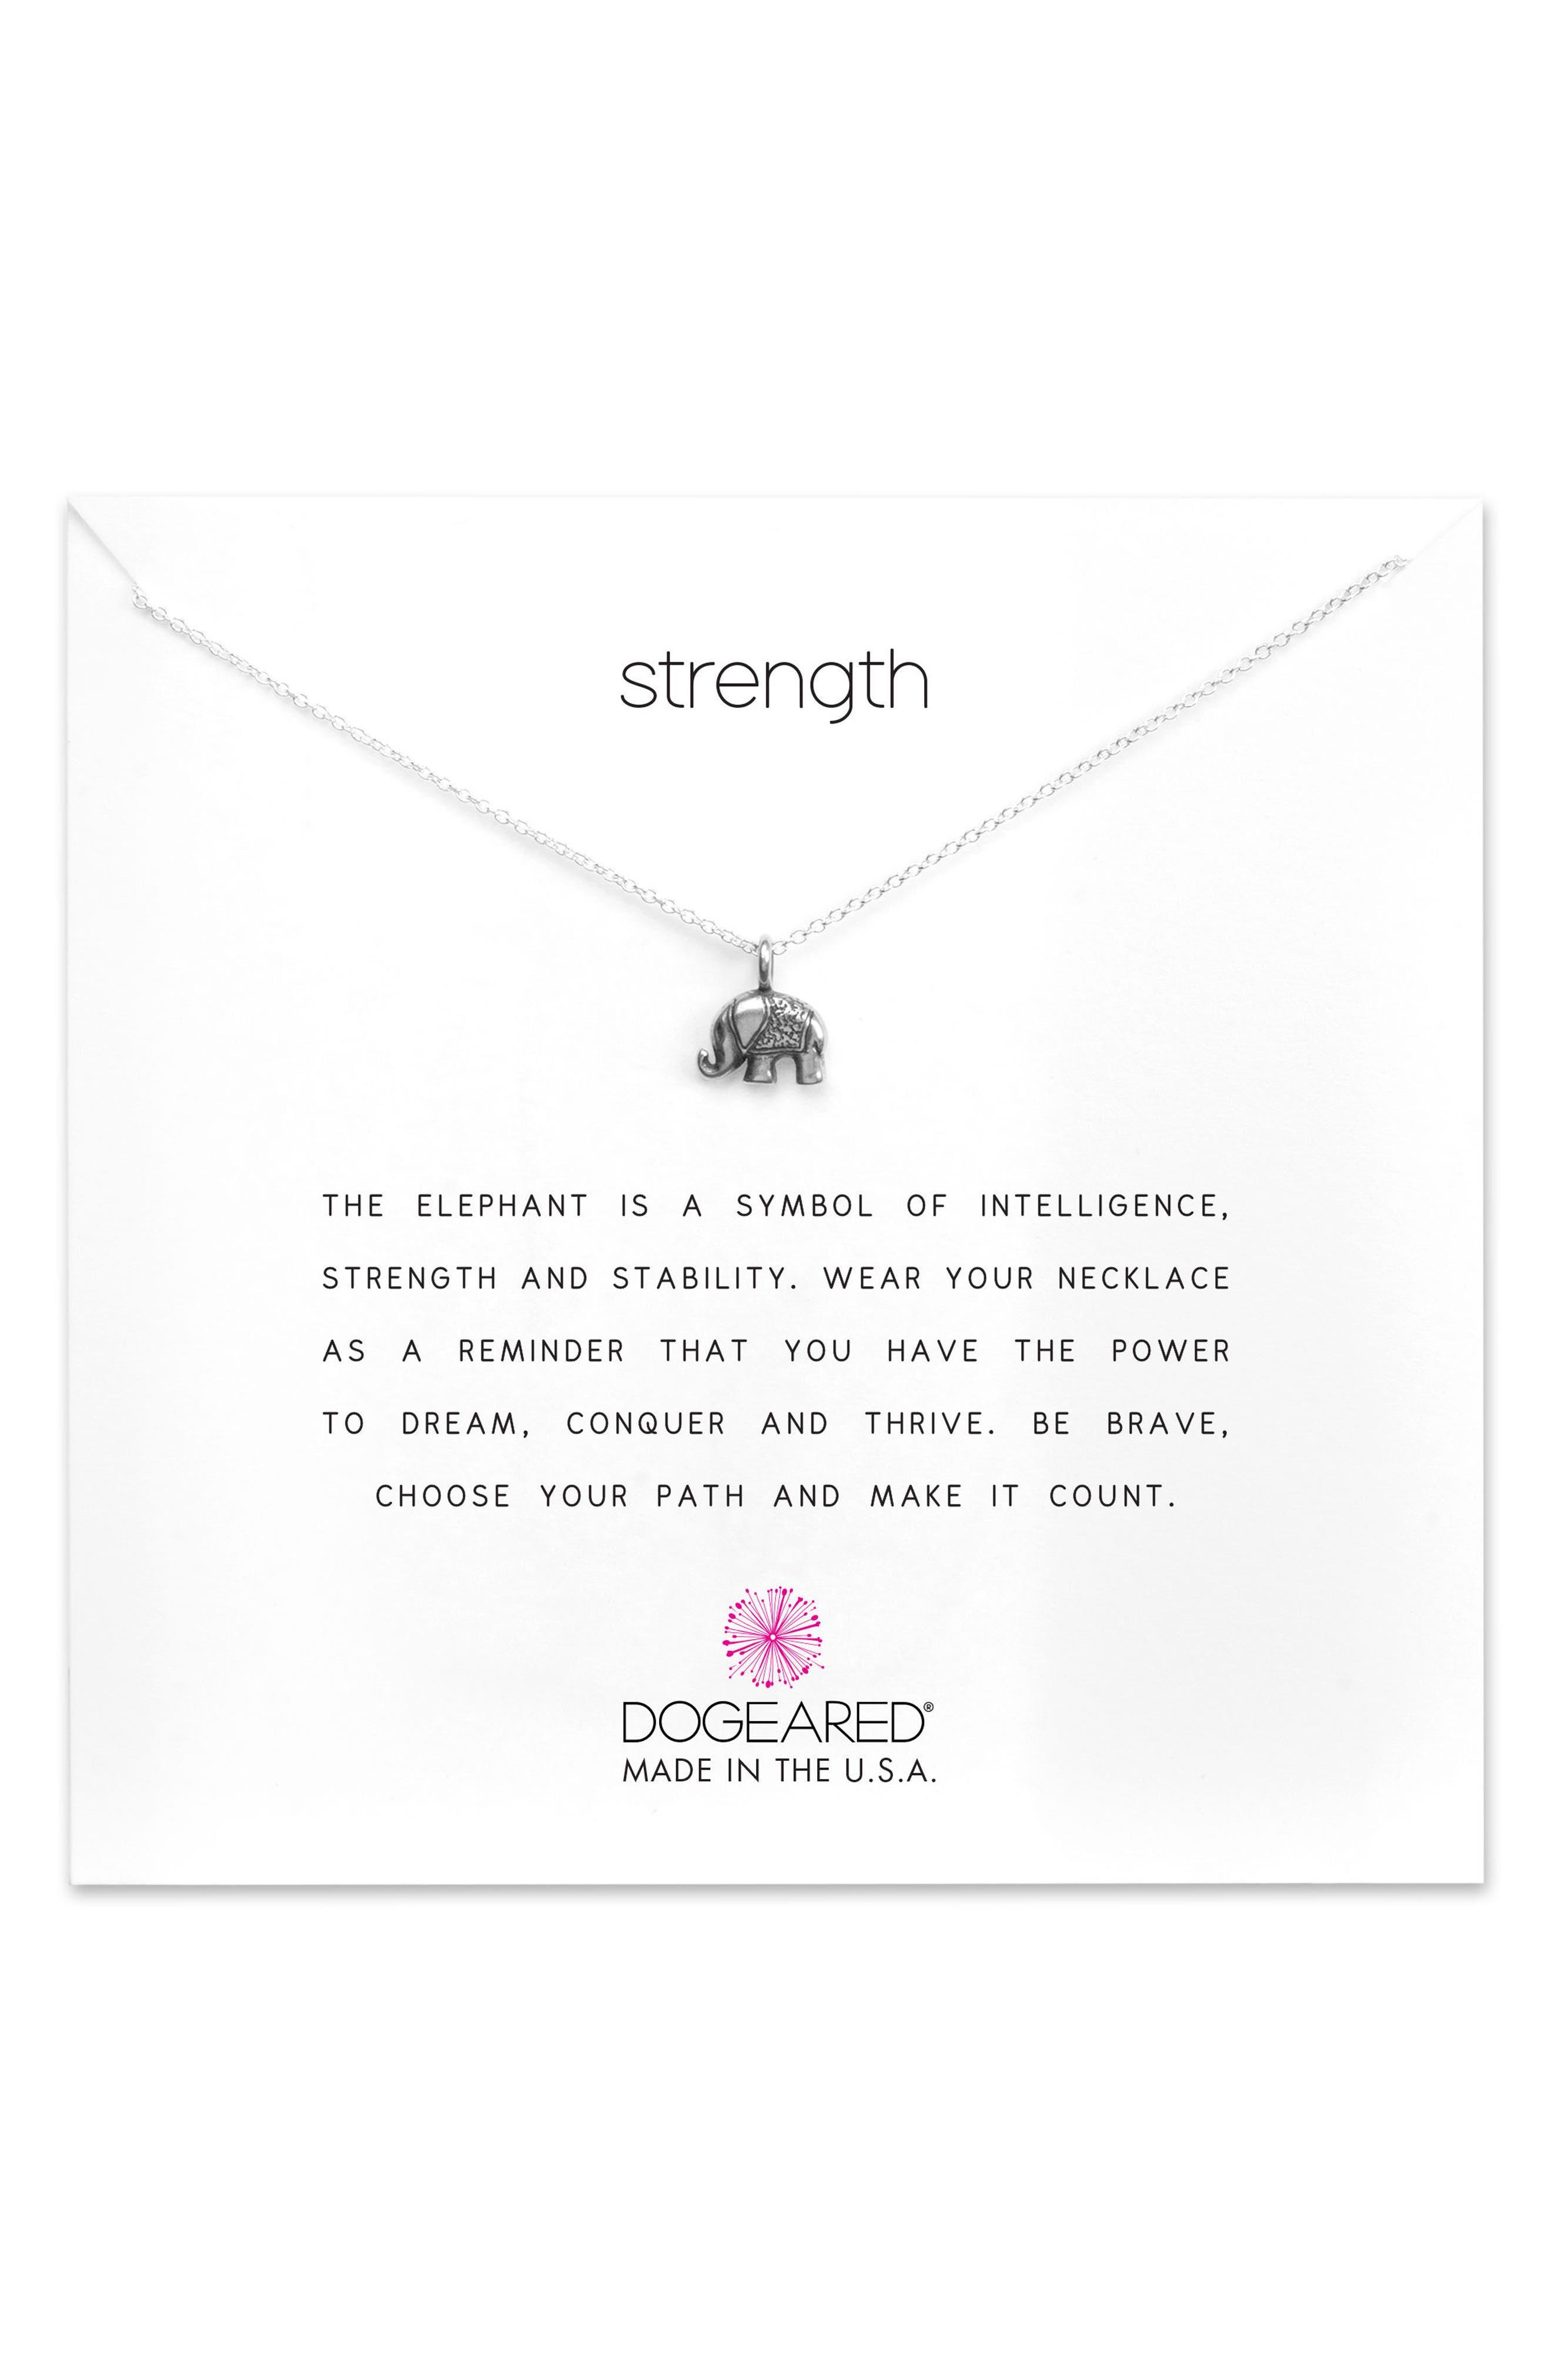 Alternate Image 1 Selected - Dogeared Reminder - Strength Pendant Necklace